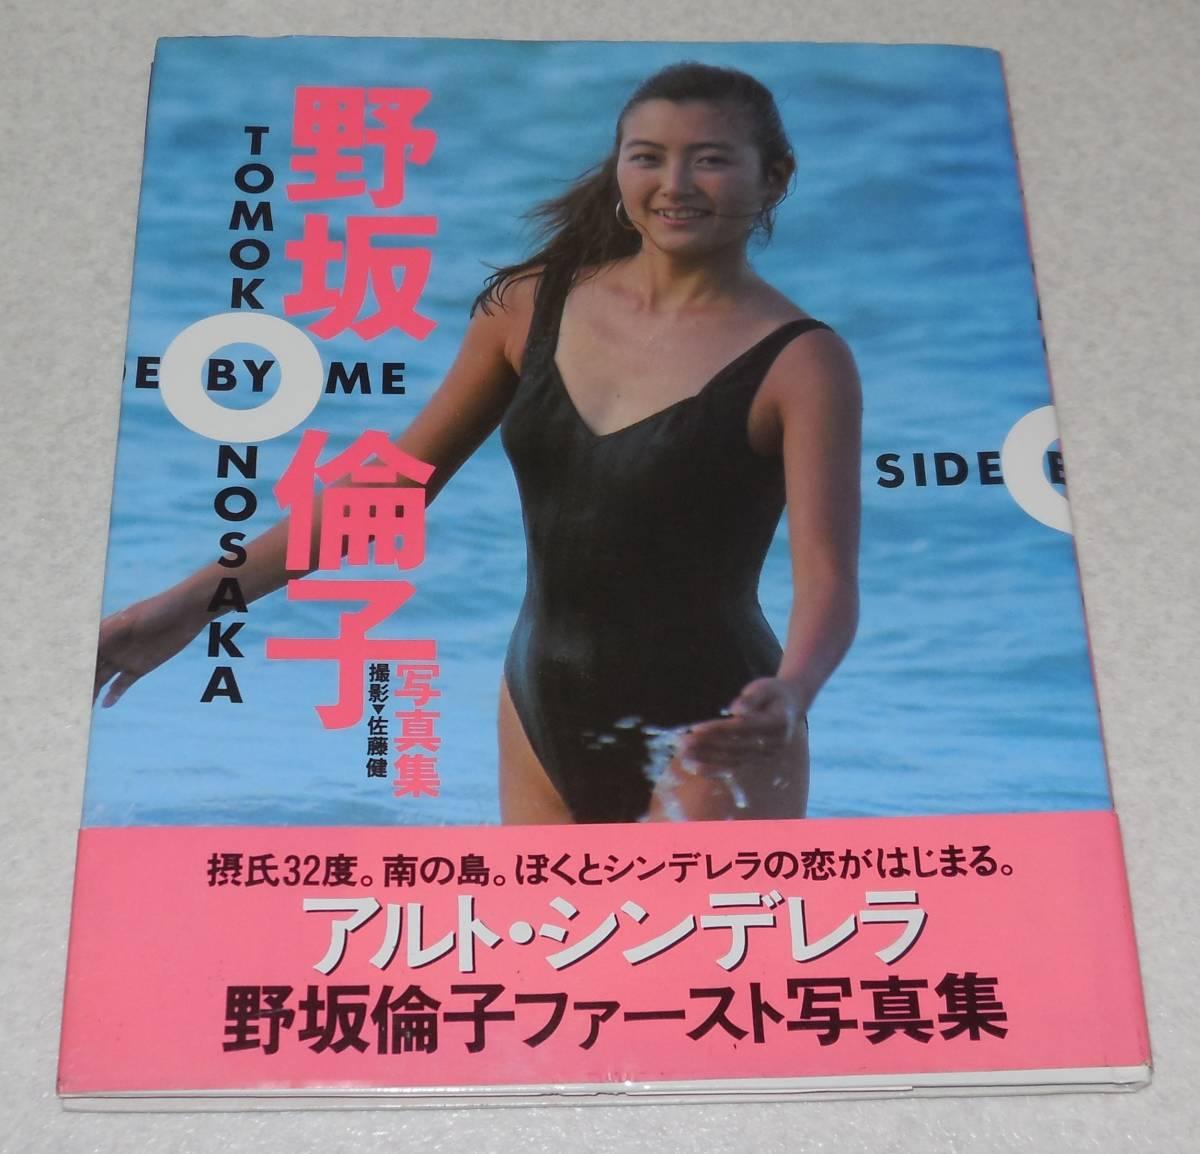 Z2/野坂倫子 写真集 「SIDE BY ME」/帯付き